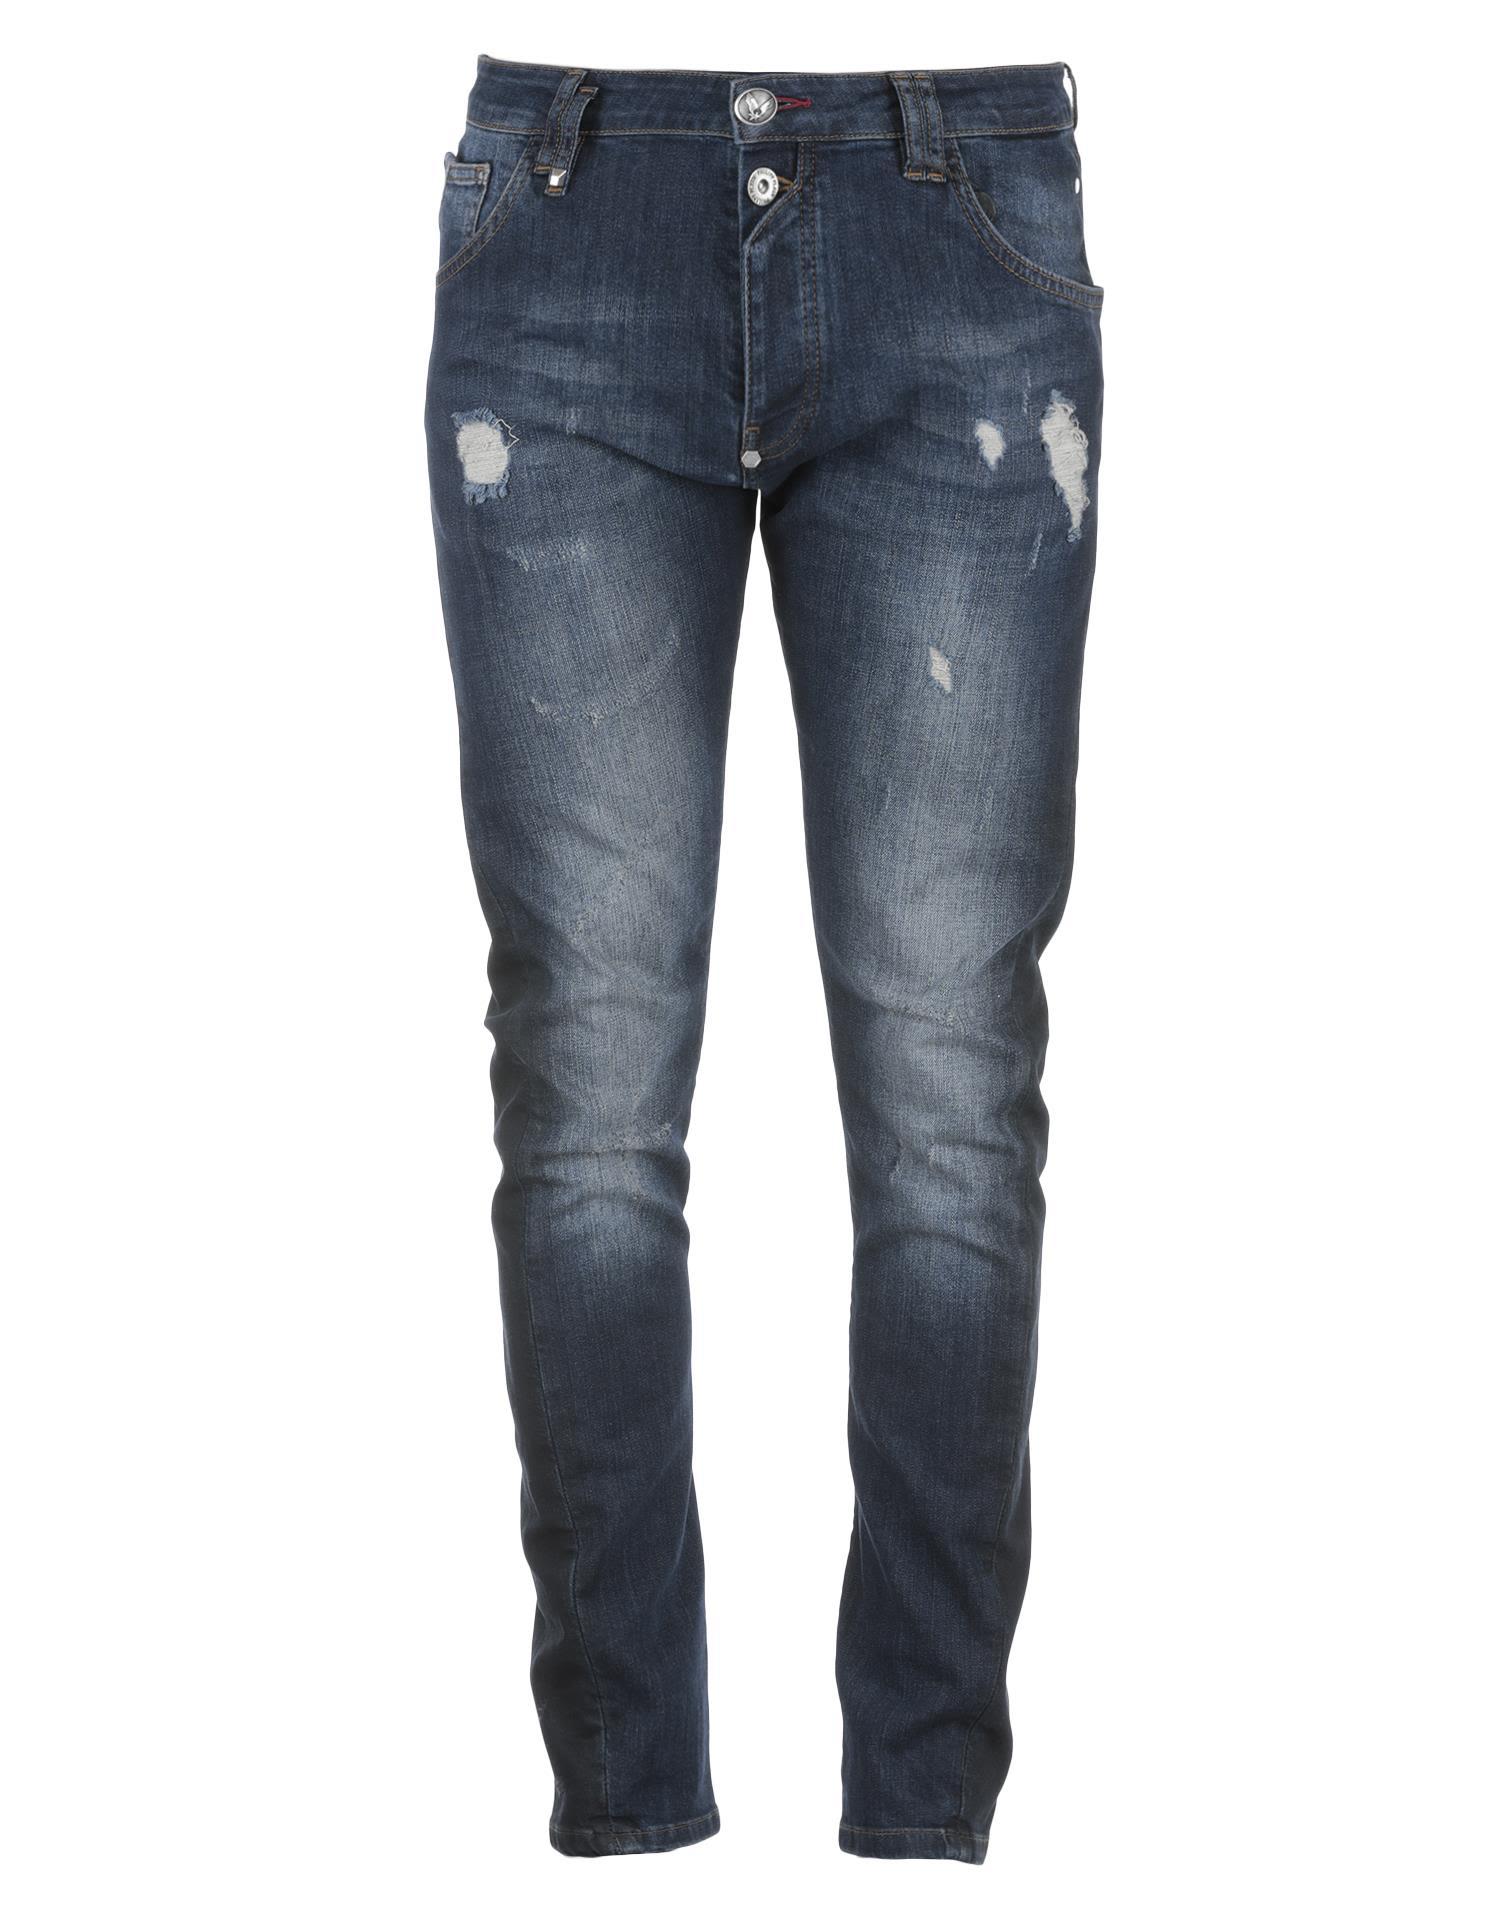 Philipp Plein Fool Super Straight Cut Jeans